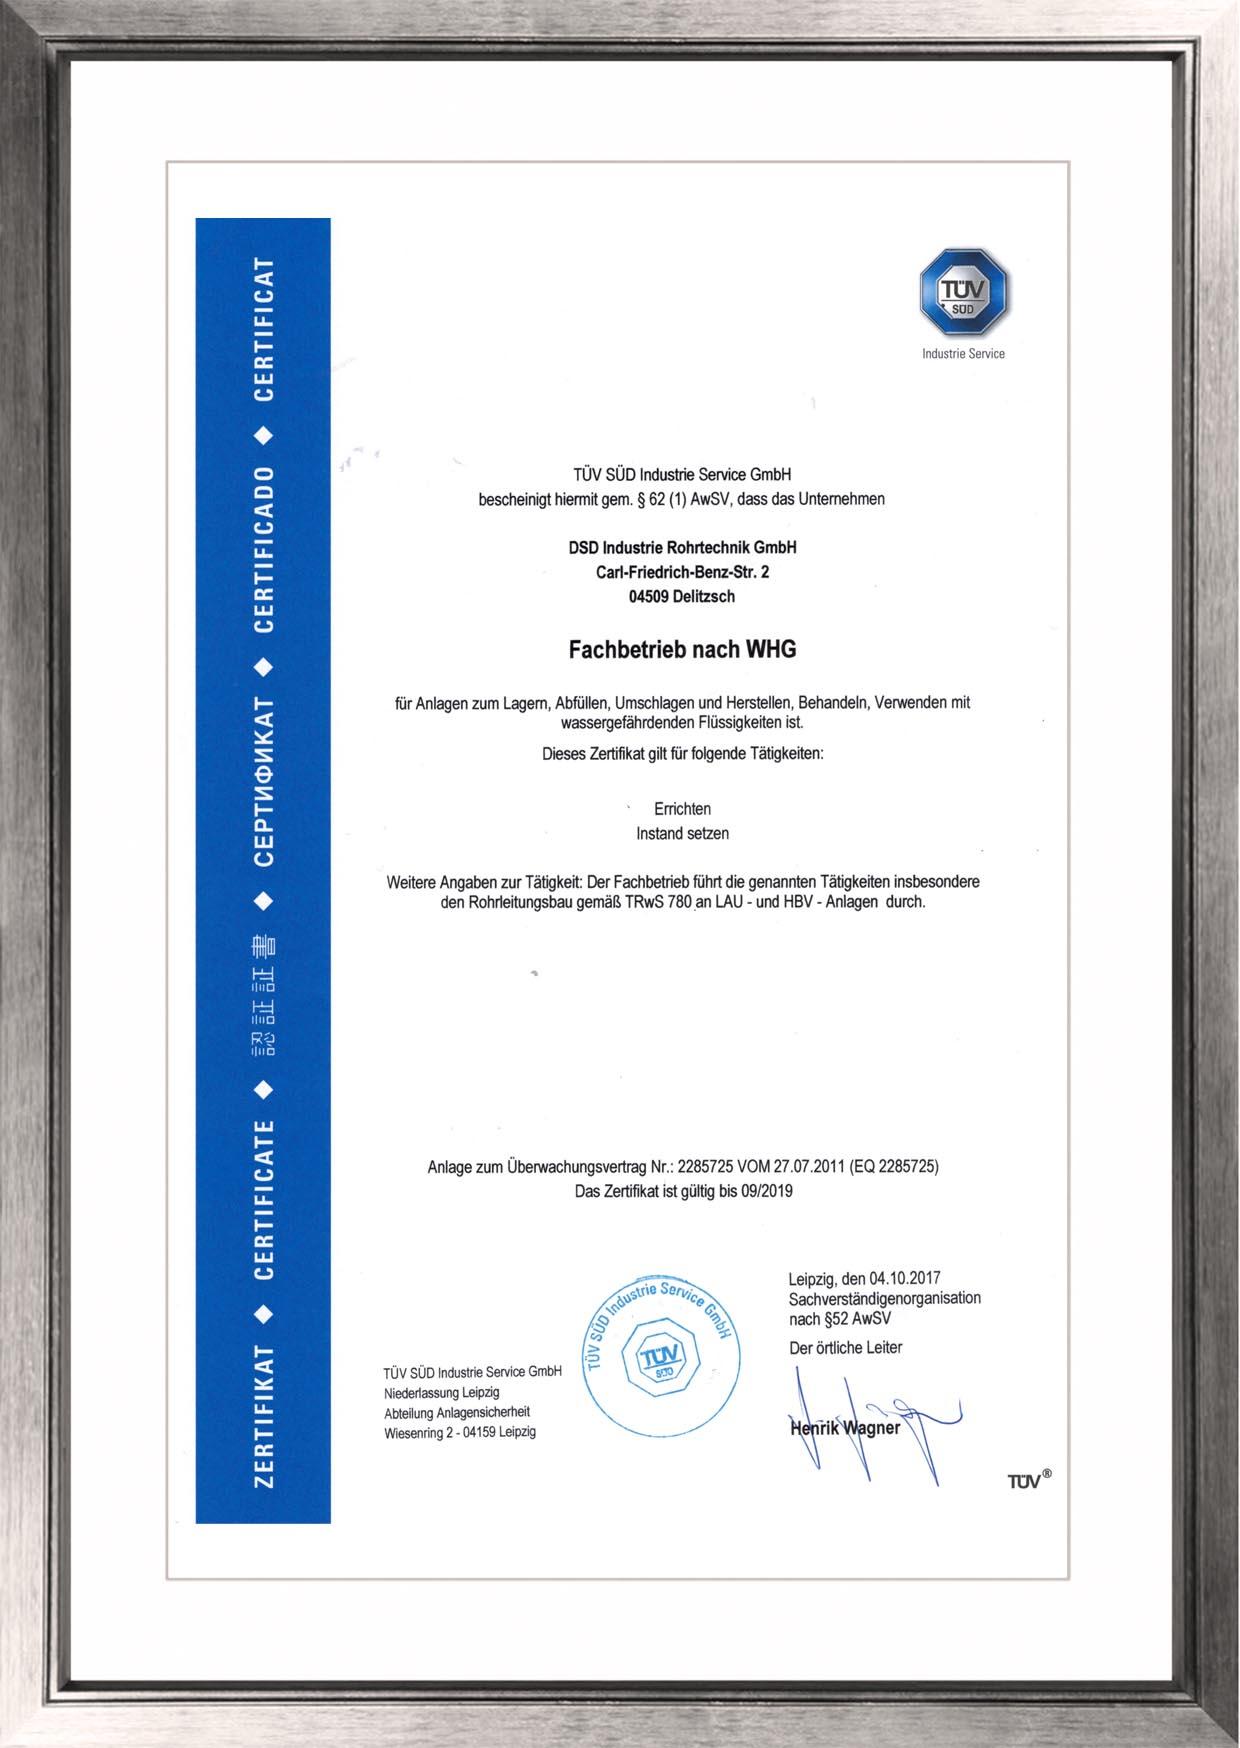 DSD Industrie Rohrtechnik, Delitzsch Privacy policy • DSD Industrie ...